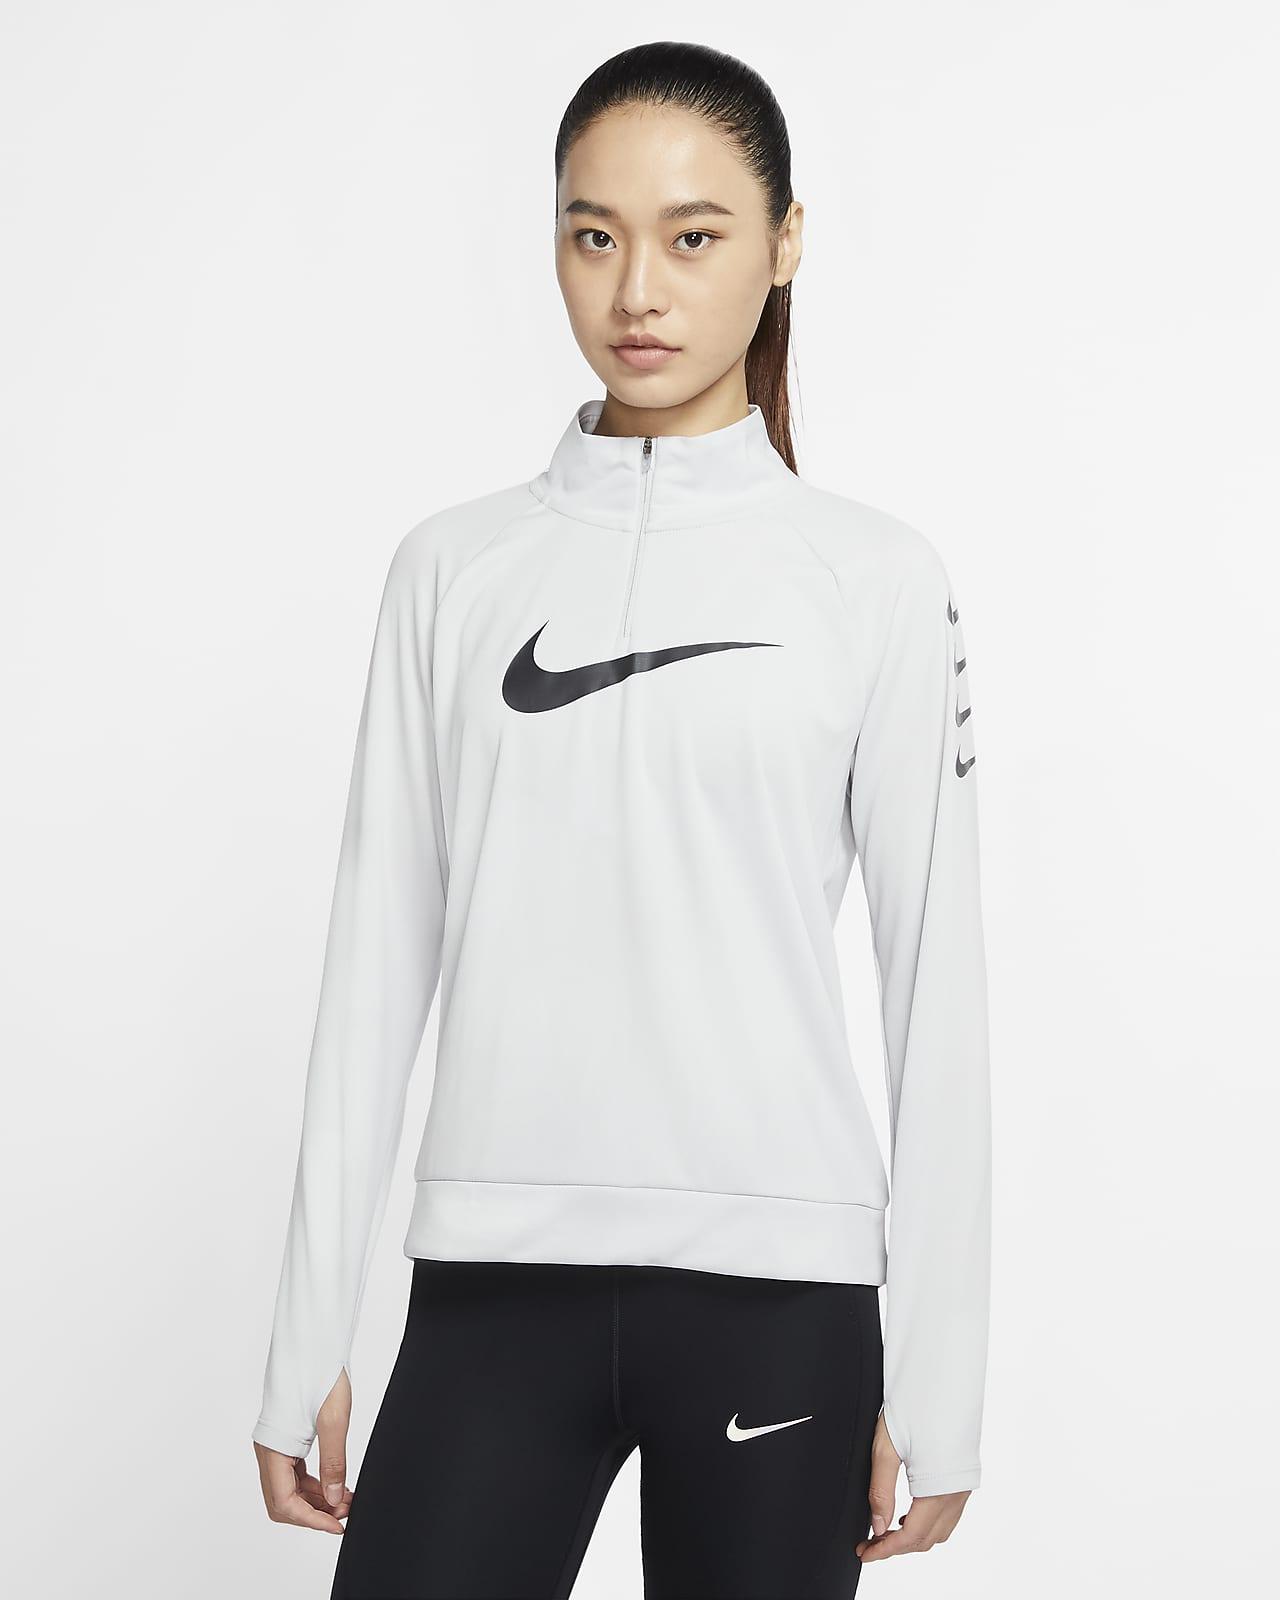 Nike Swoosh Run 女子 1/4 拉链开襟跑步上衣